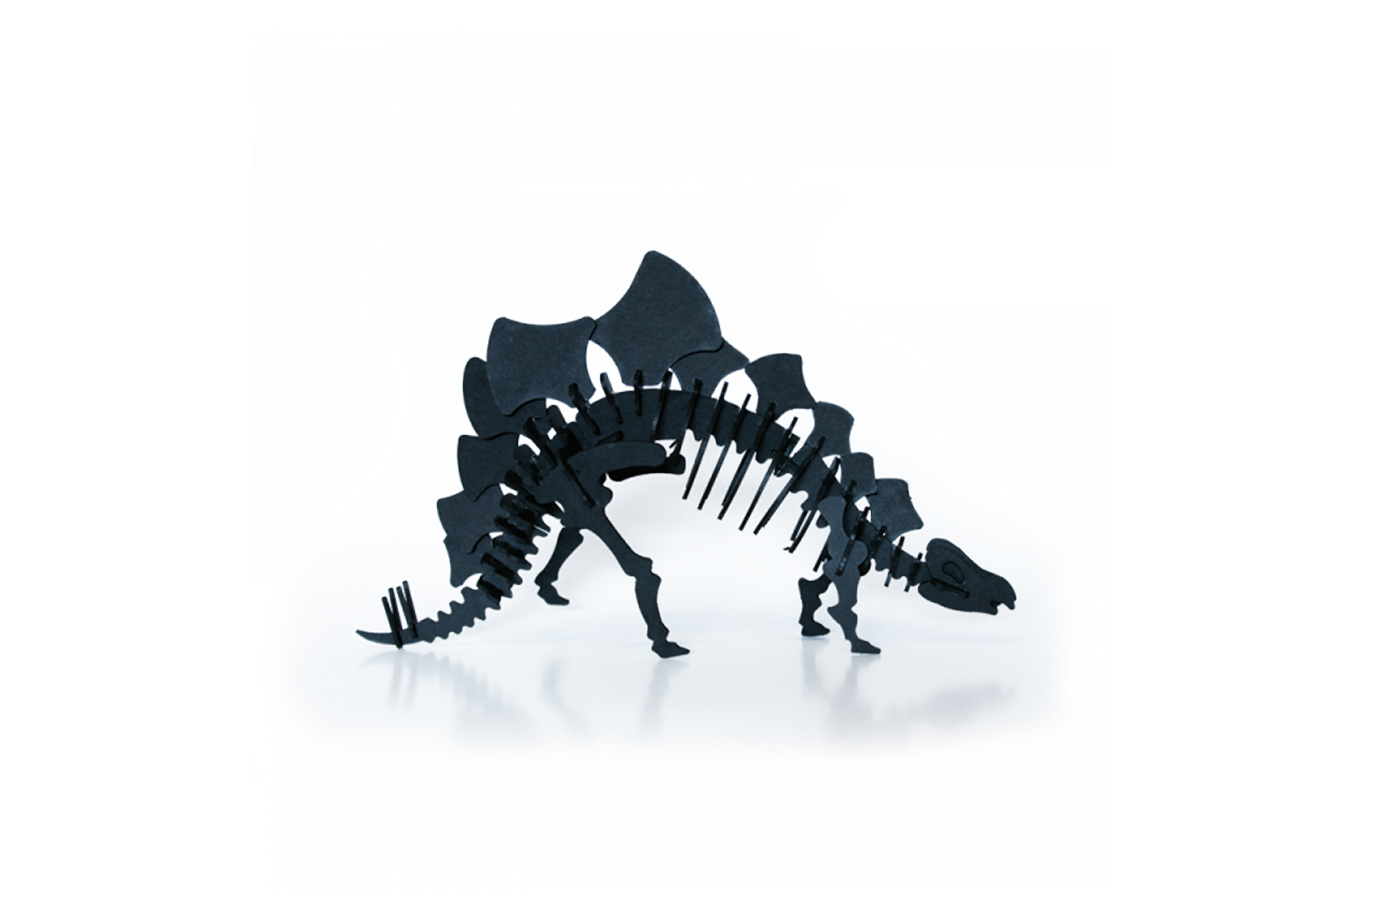 Stegosaurus en carton 2 2000000007007